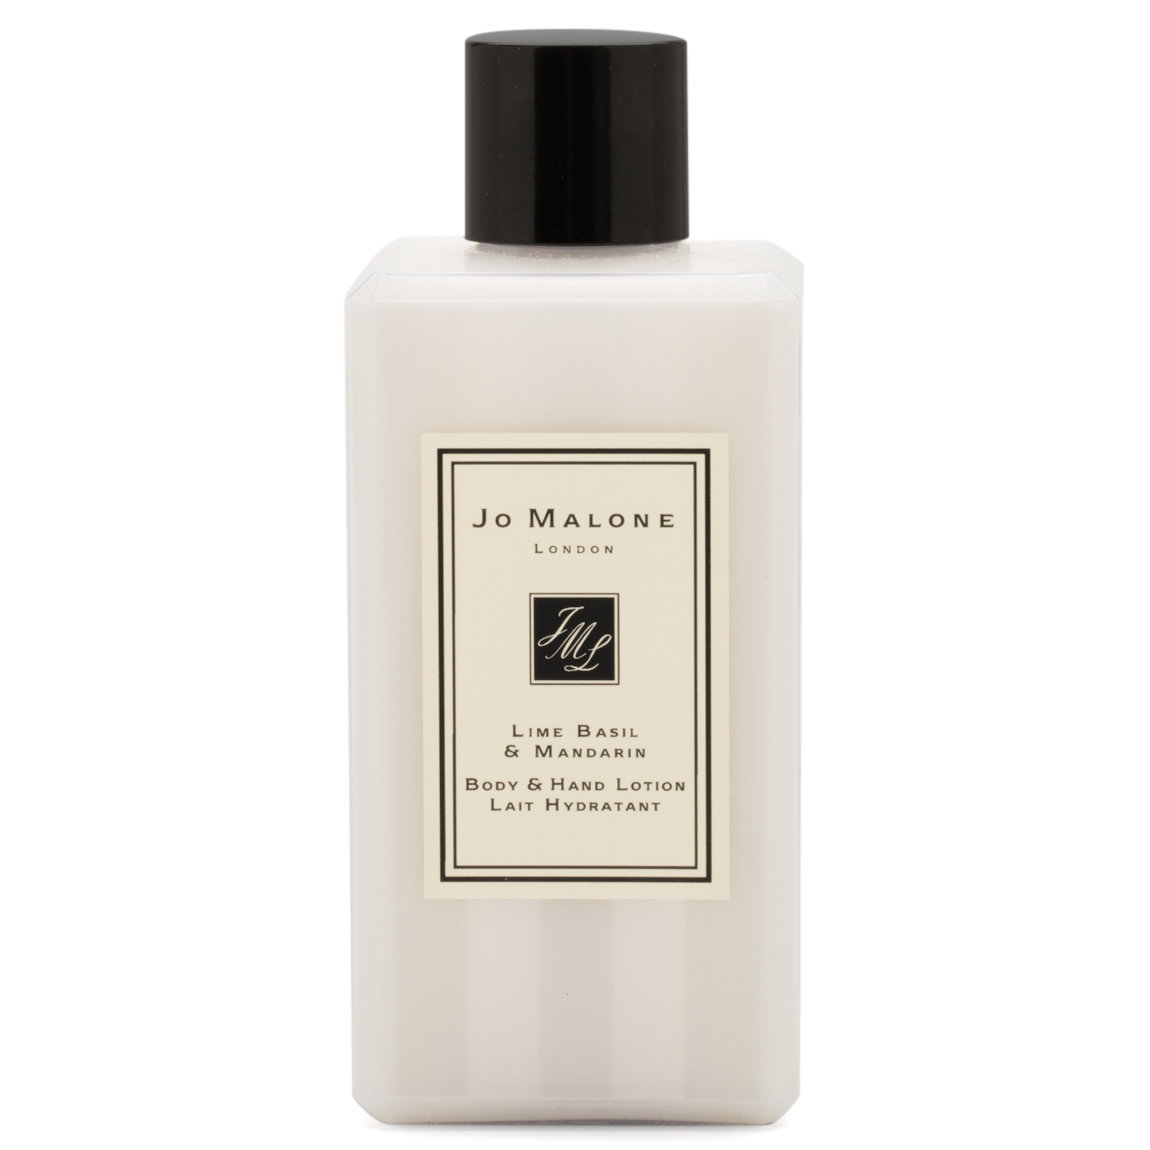 Jo Malone London Lime Basil & Mandarin Body & Hand Lotion 100 ml alternative view 1 - product swatch.